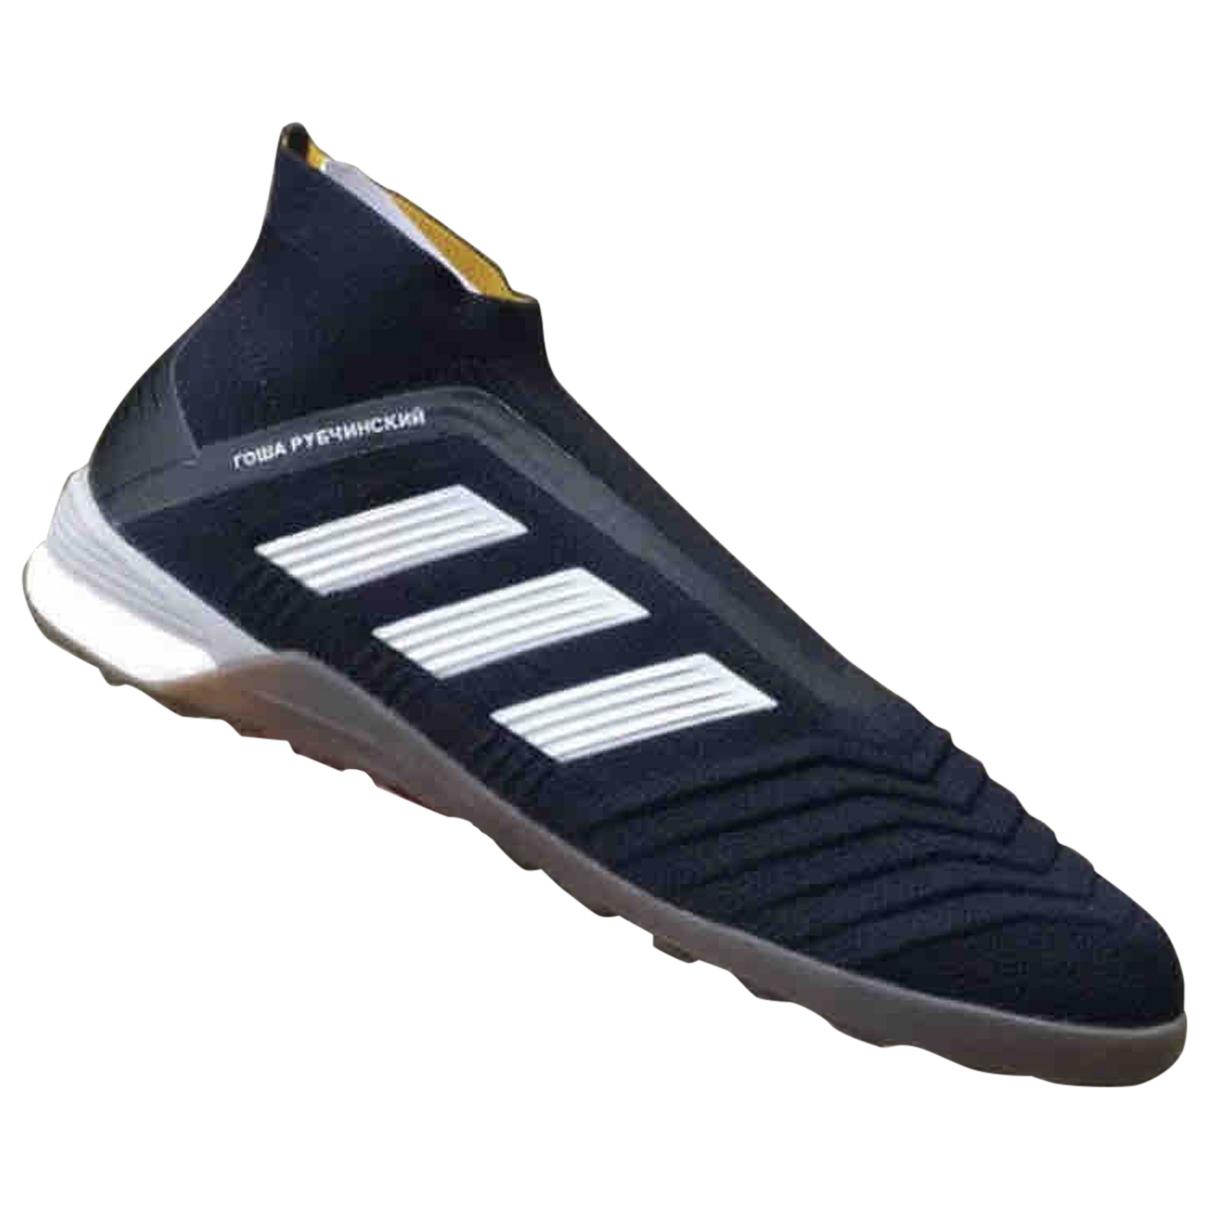 Adidas X Gosha Rubchinskiy \N Sneakers in  Schwarz Leinen